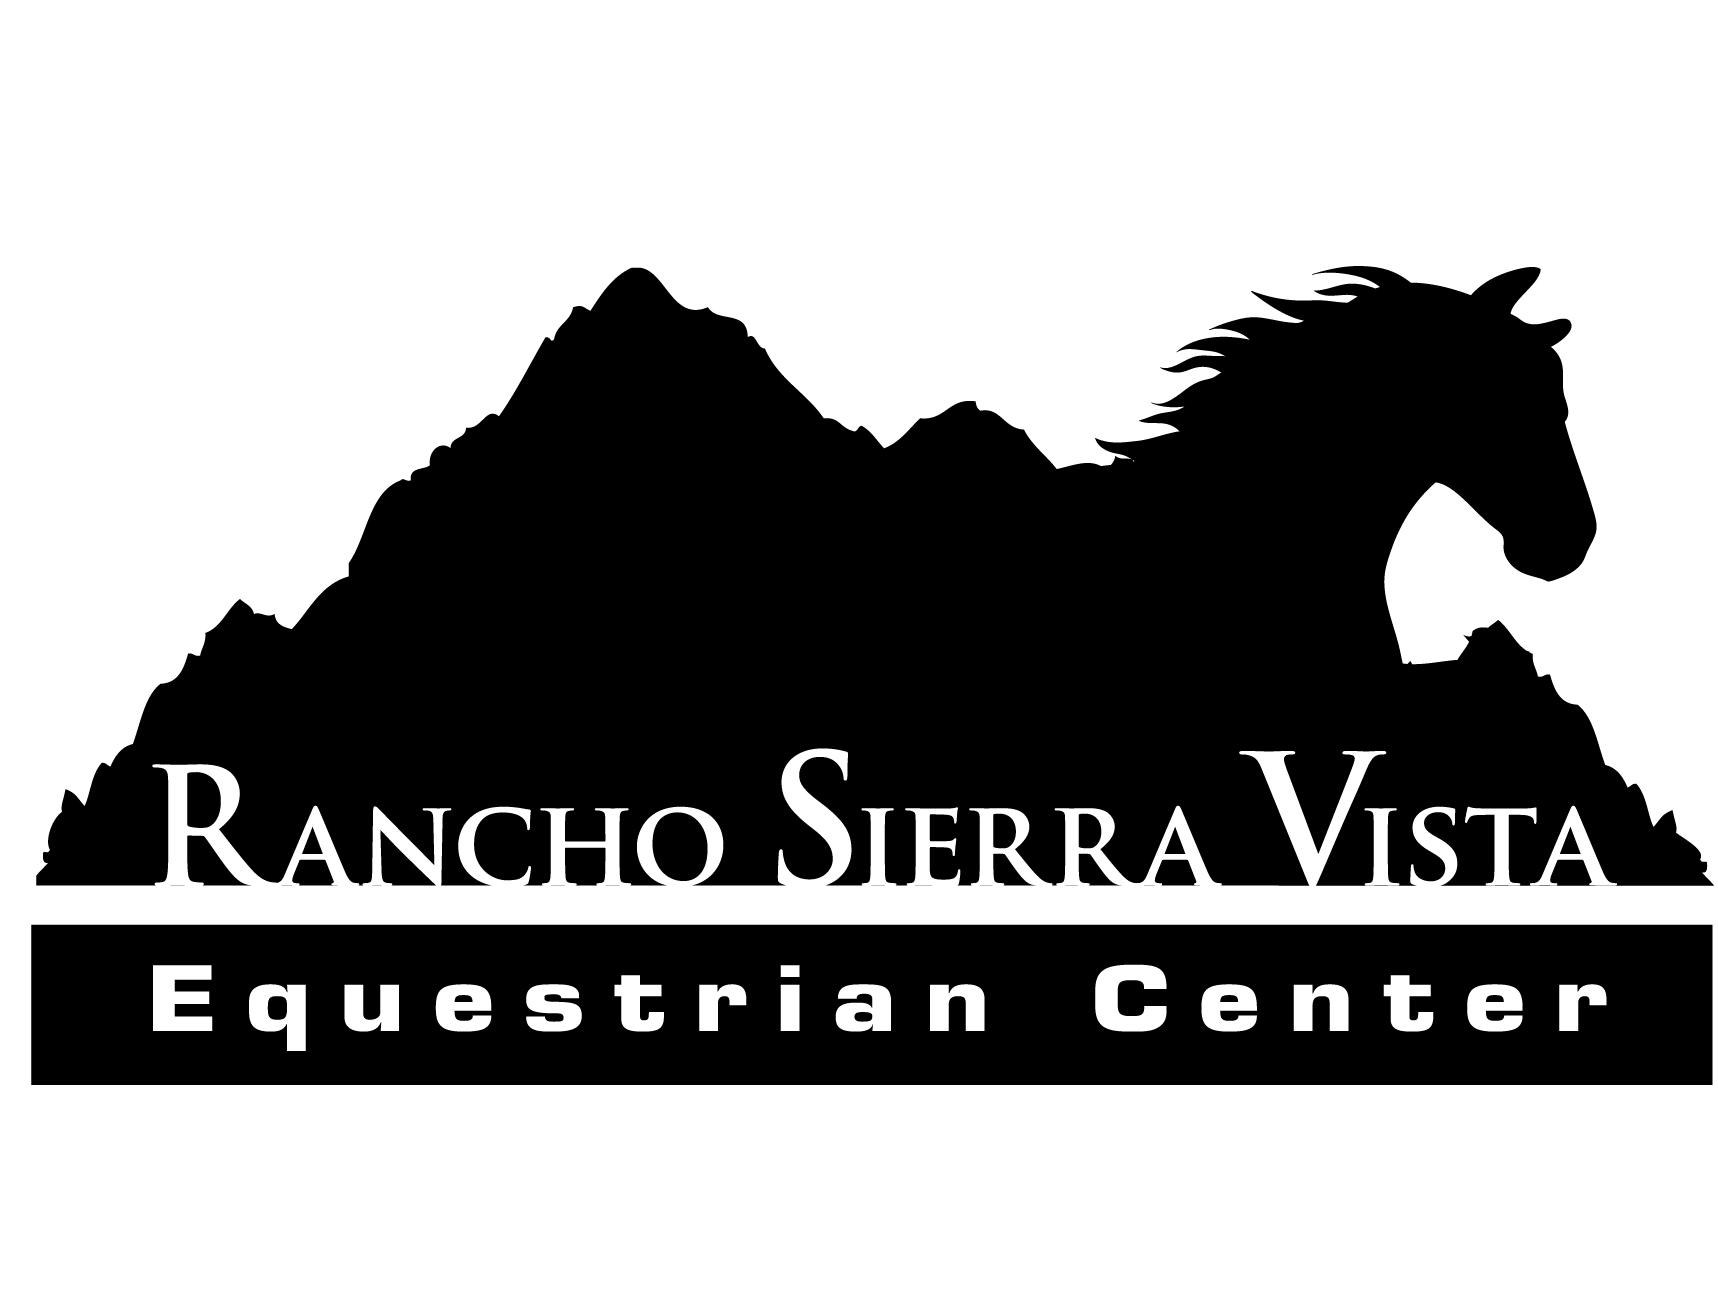 Rancho Sierra Vista Equestrian Center